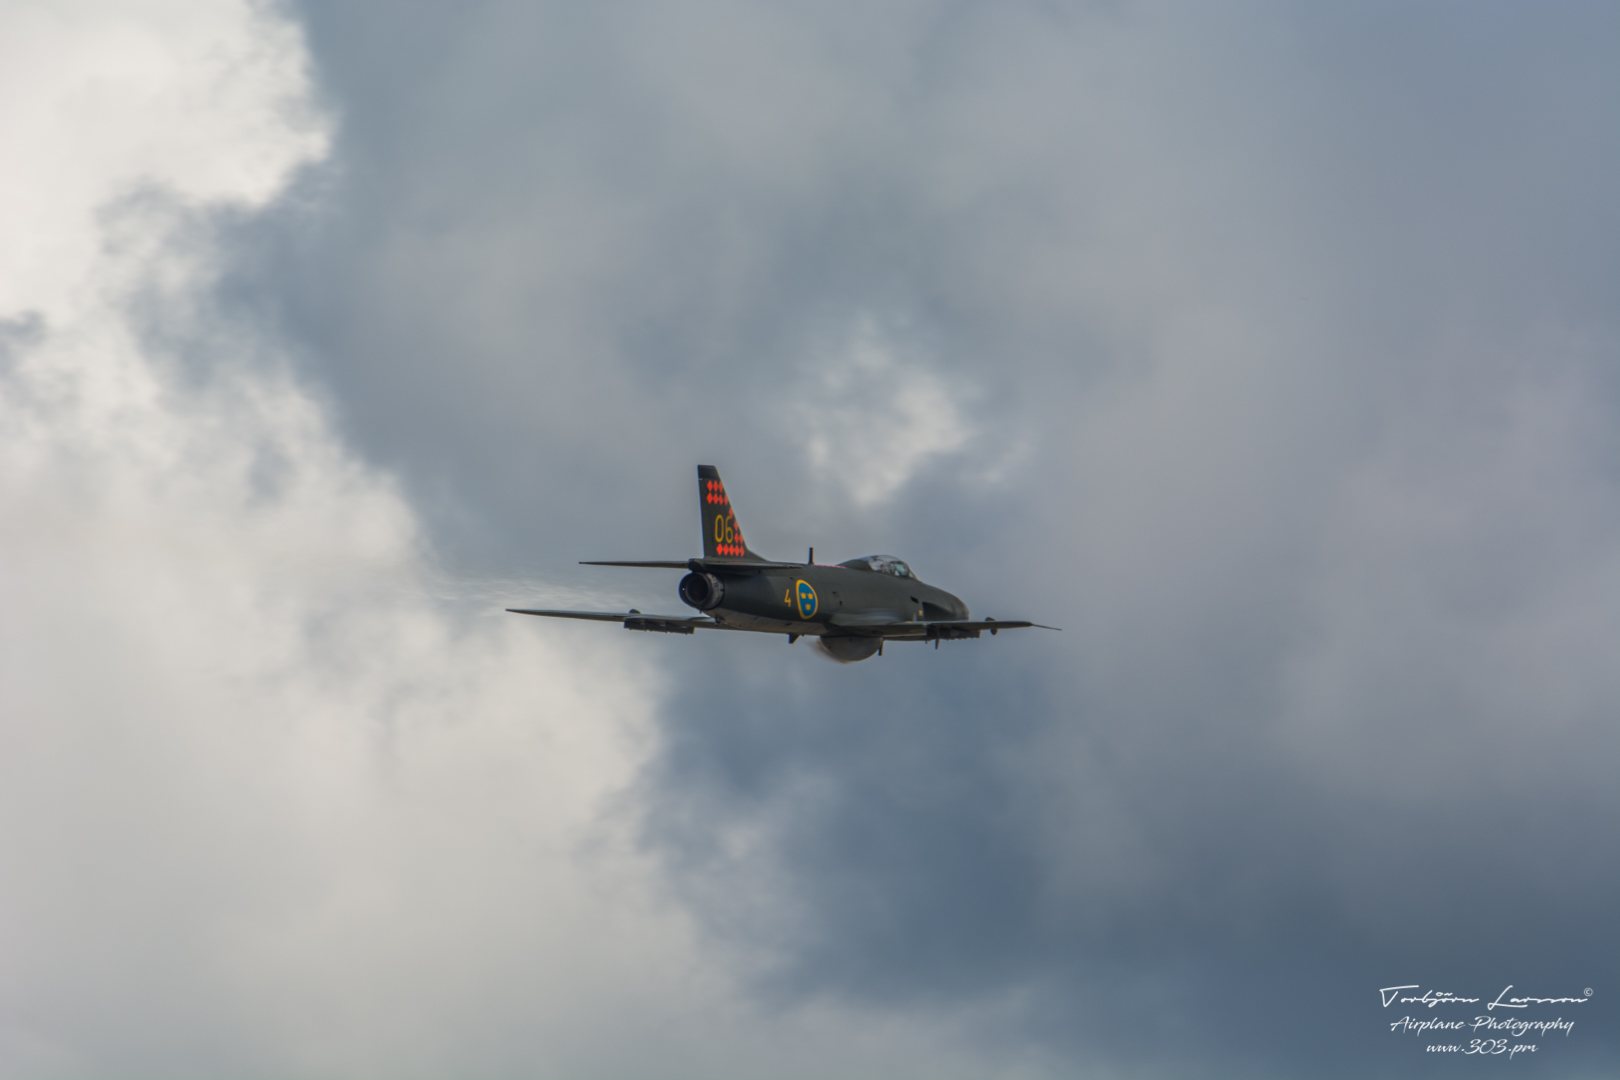 TBE_4769-Saab Lansen-J32E (SE-RME)